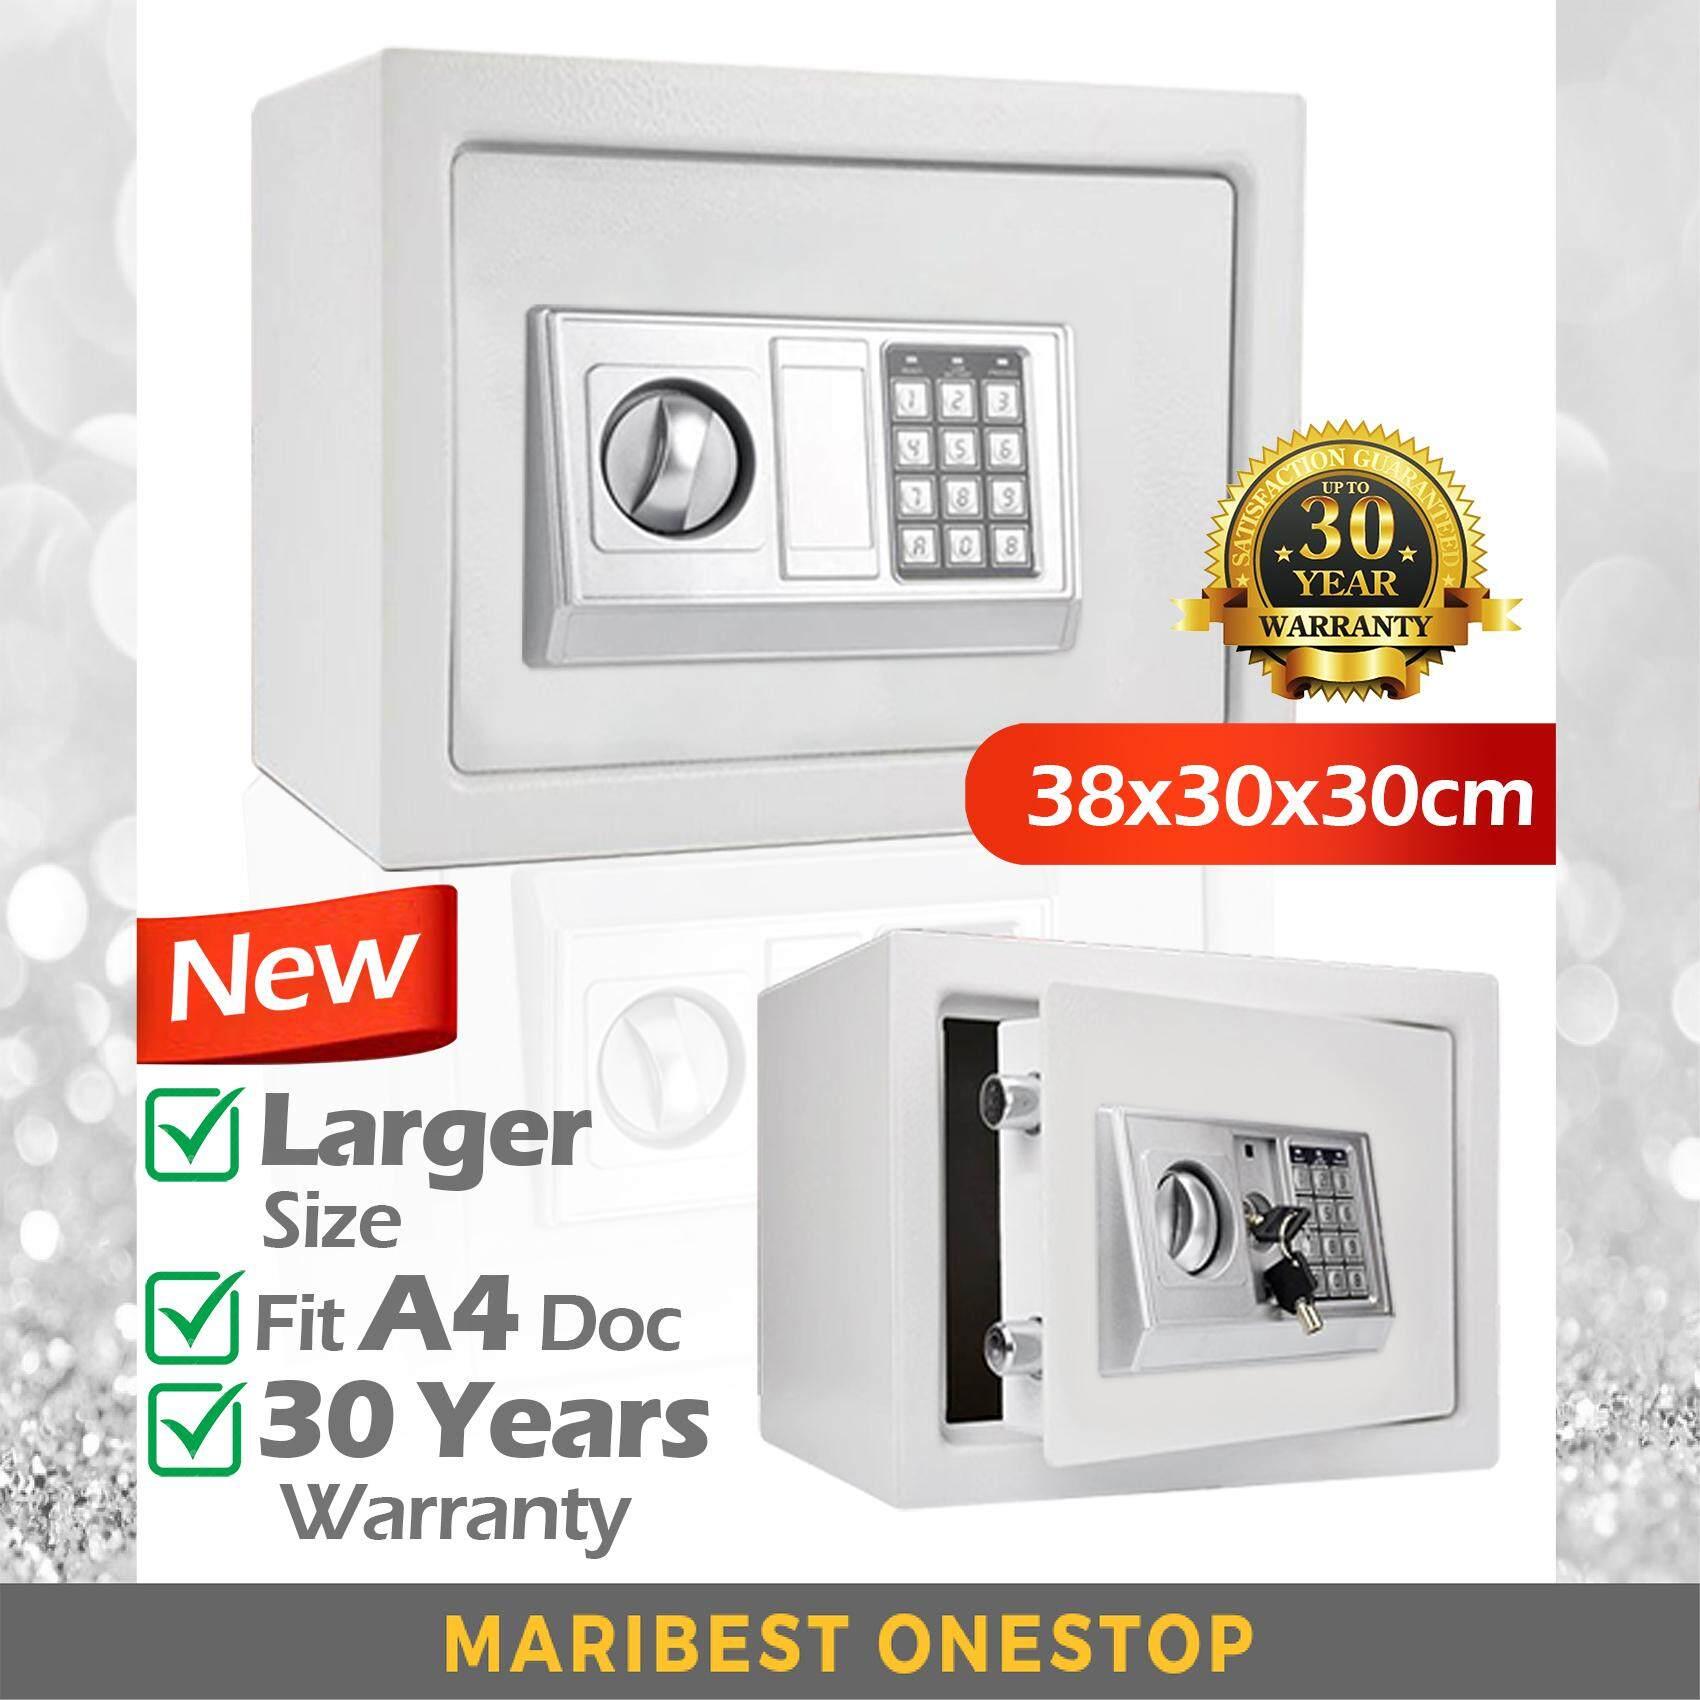 8 5KG Large 38cm Fit A4 Size Safety Box Safe Box Burglary Safe Box  Anti-Theft Box (White)